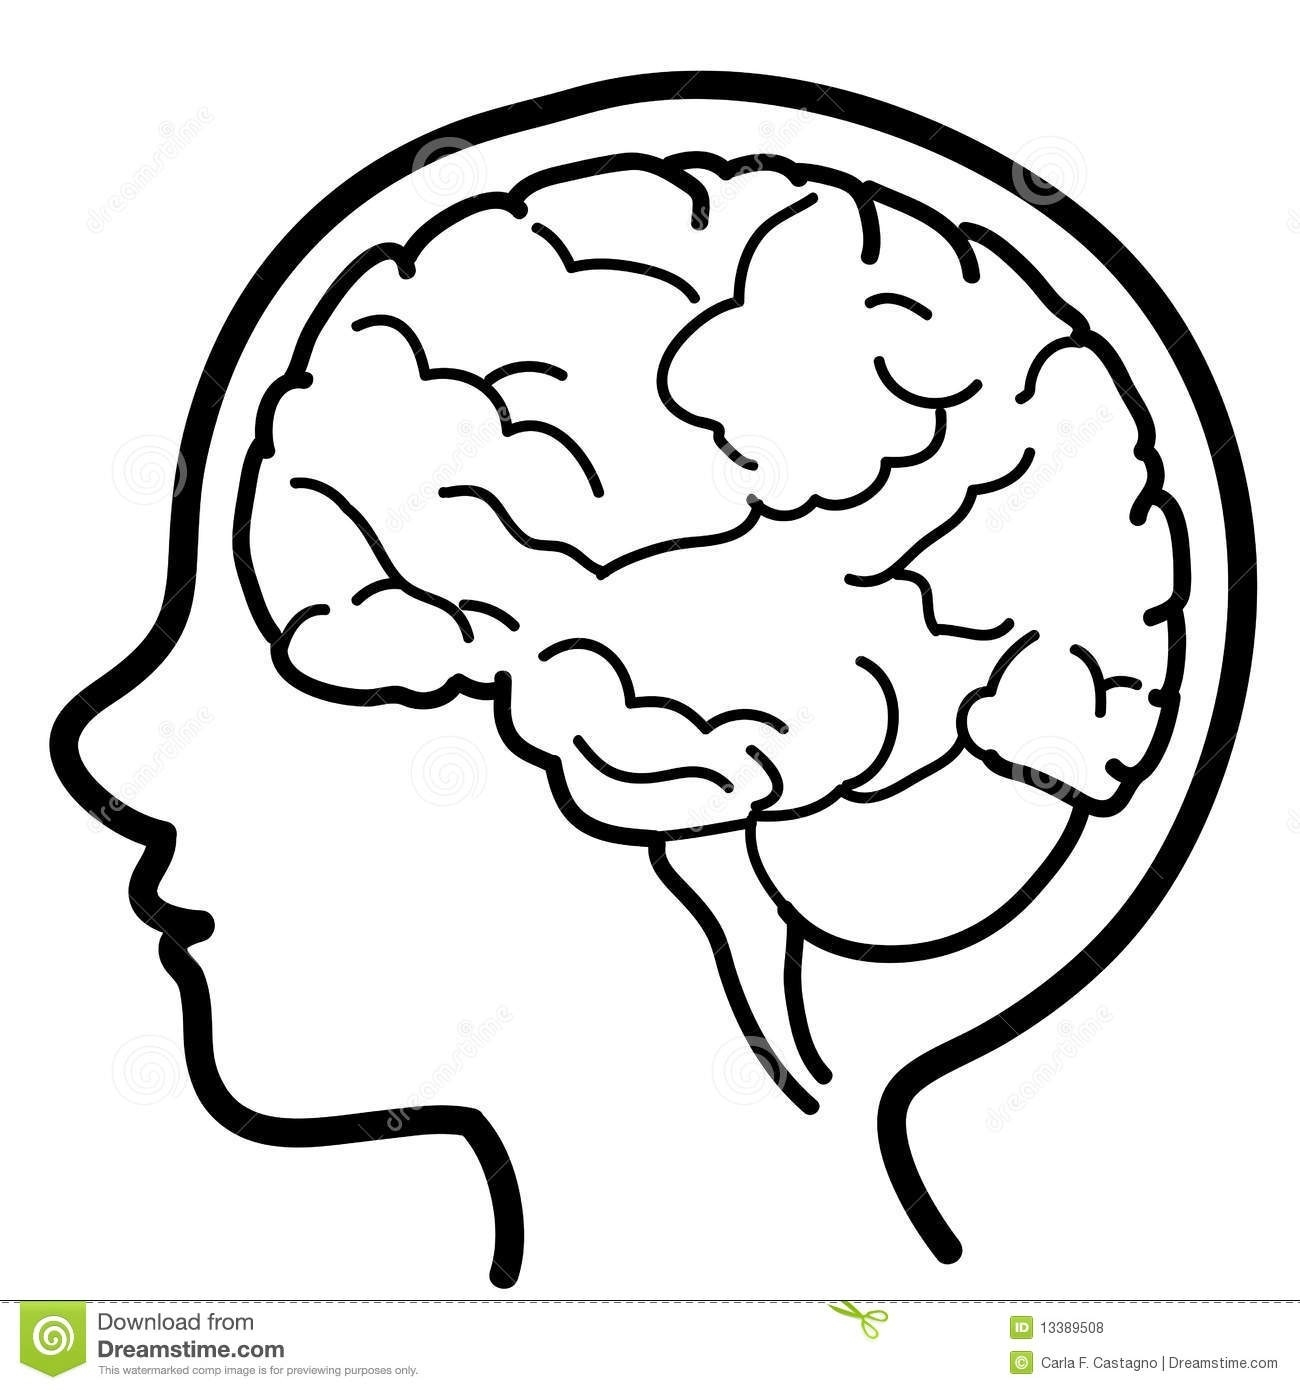 Thinking brain clipart black and white jpg freeuse download Thinking Brain Clipart Black And White Hd   Letters with ... jpg freeuse download